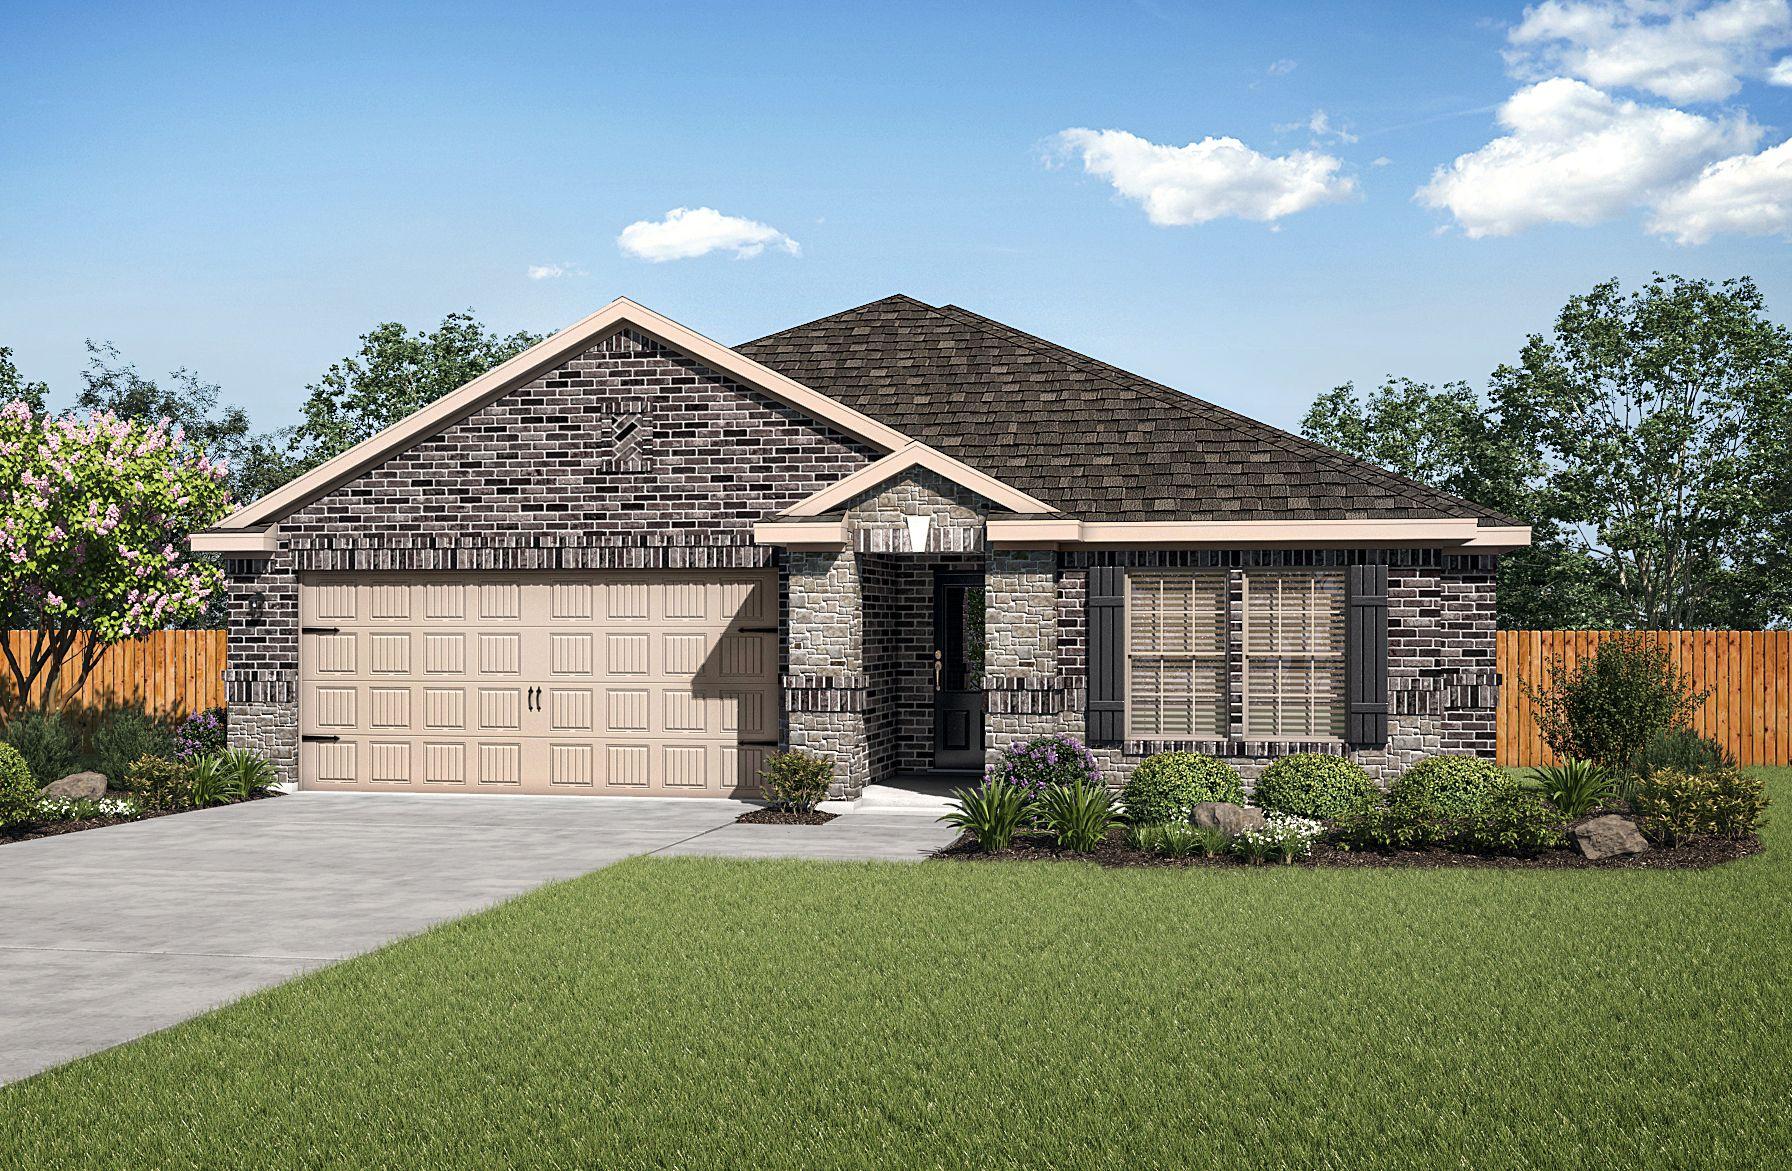 The Kendall by LGI Homes:The Kendall by LGI Homes